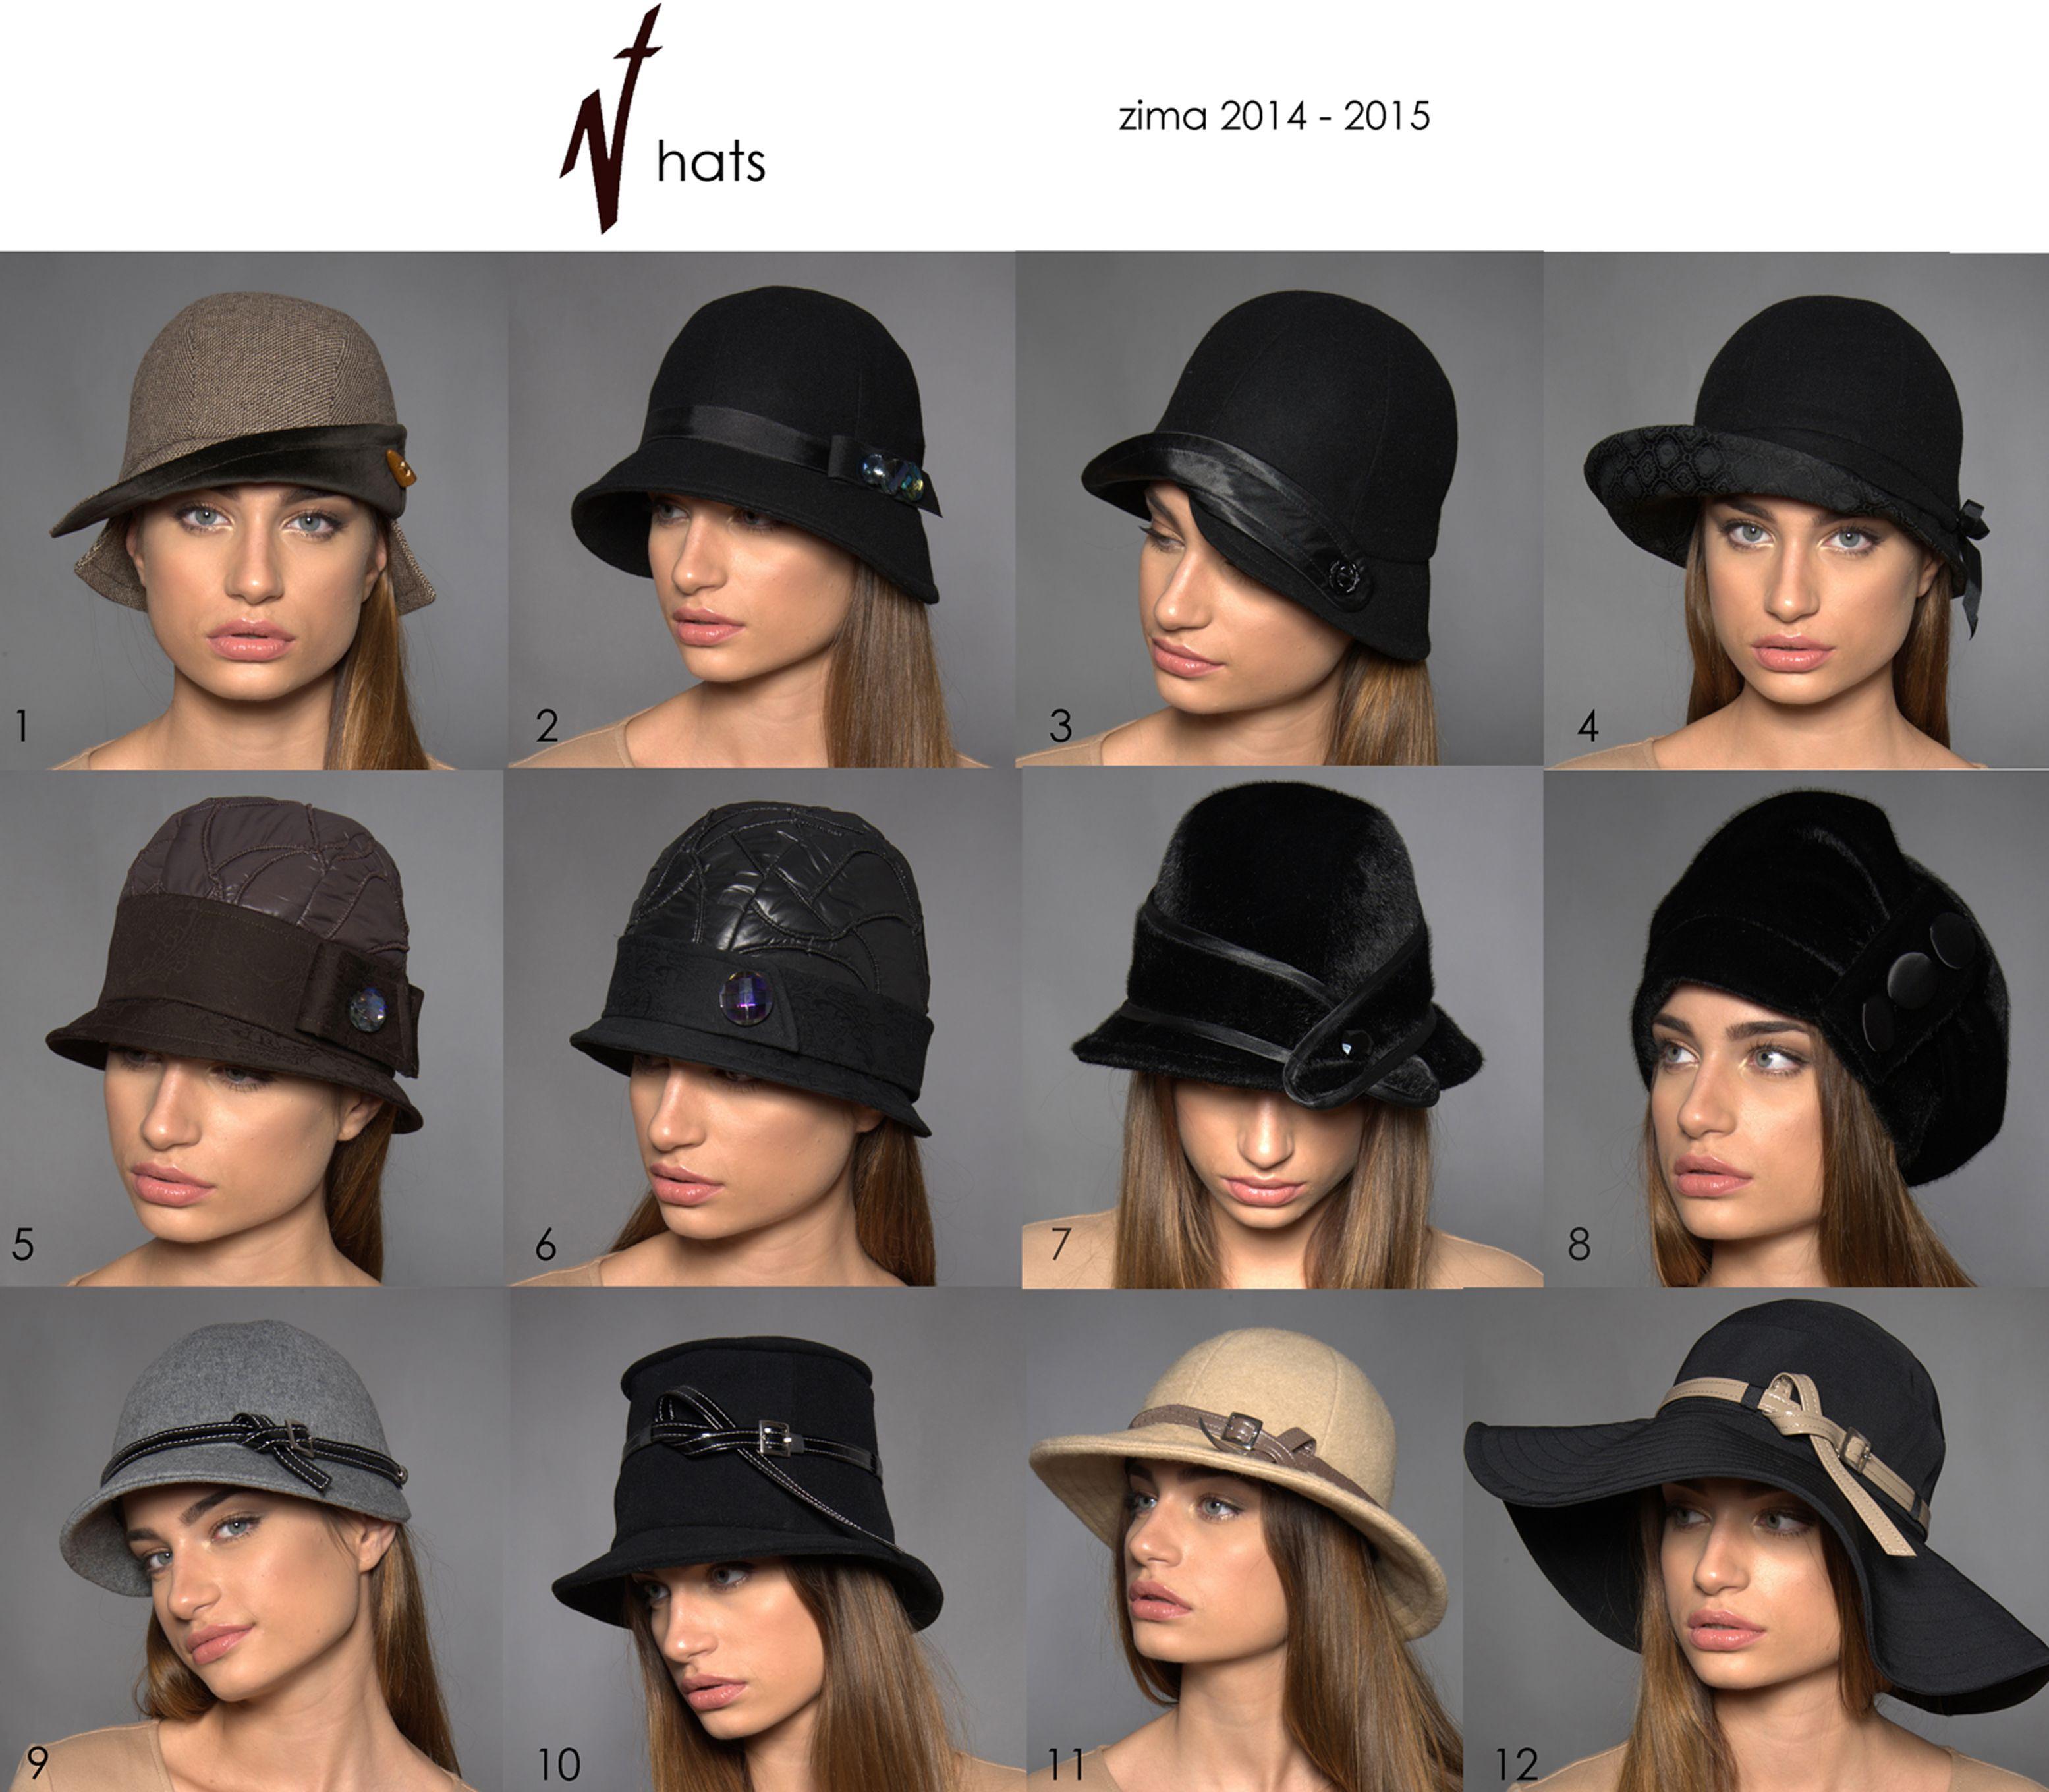 Nf hats - winter 2014/2015